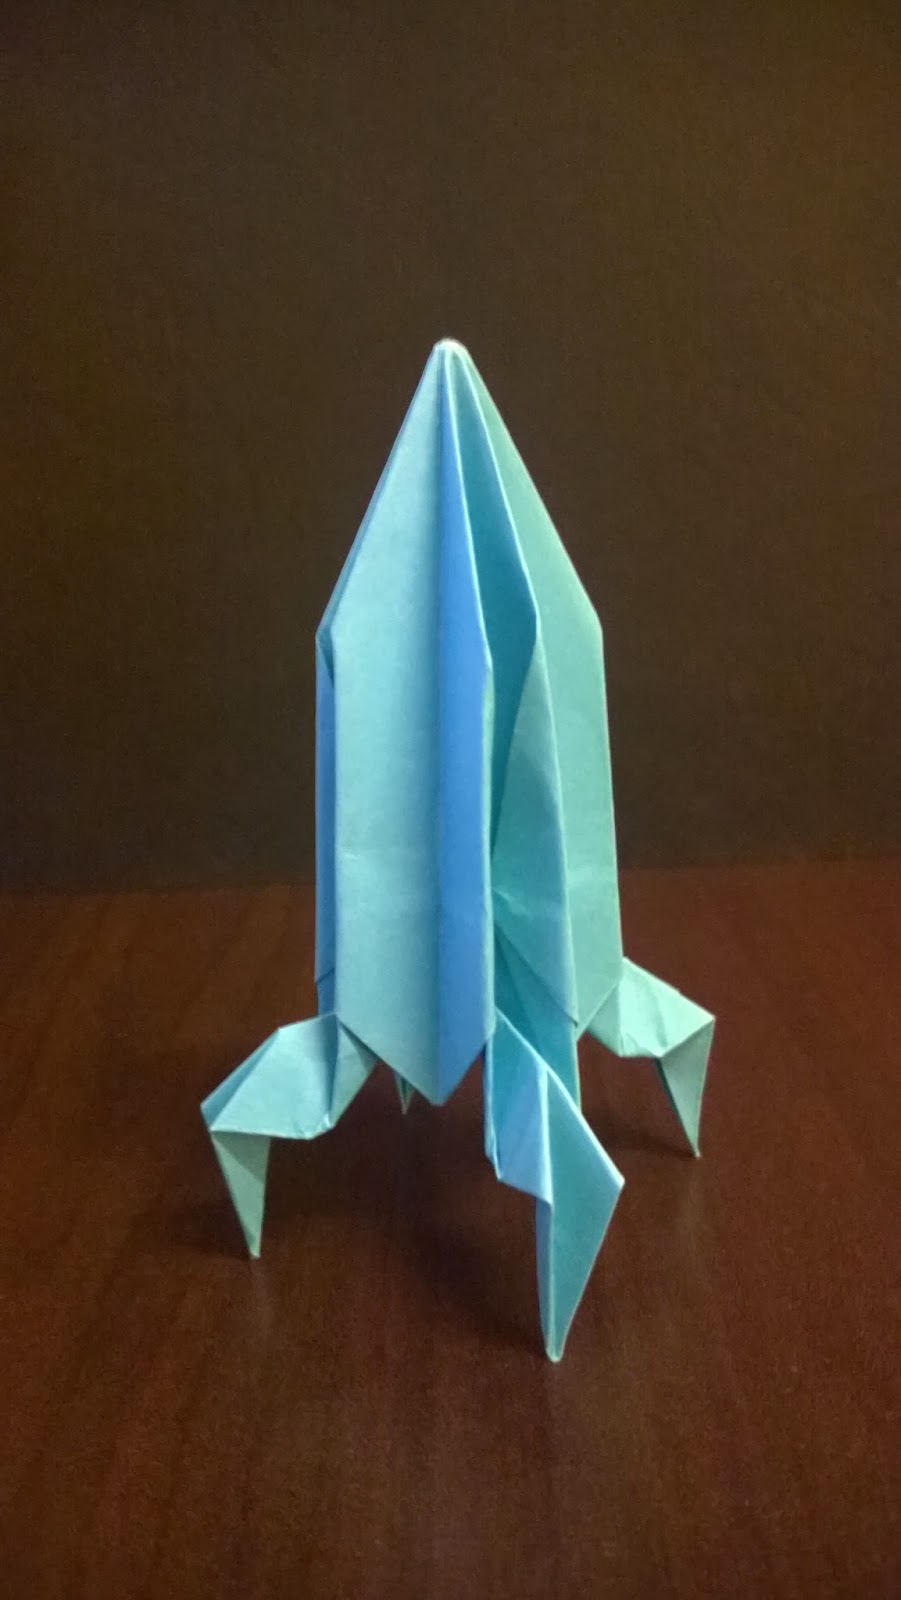 Yoshinys Design How To Fold An Origami Rocket